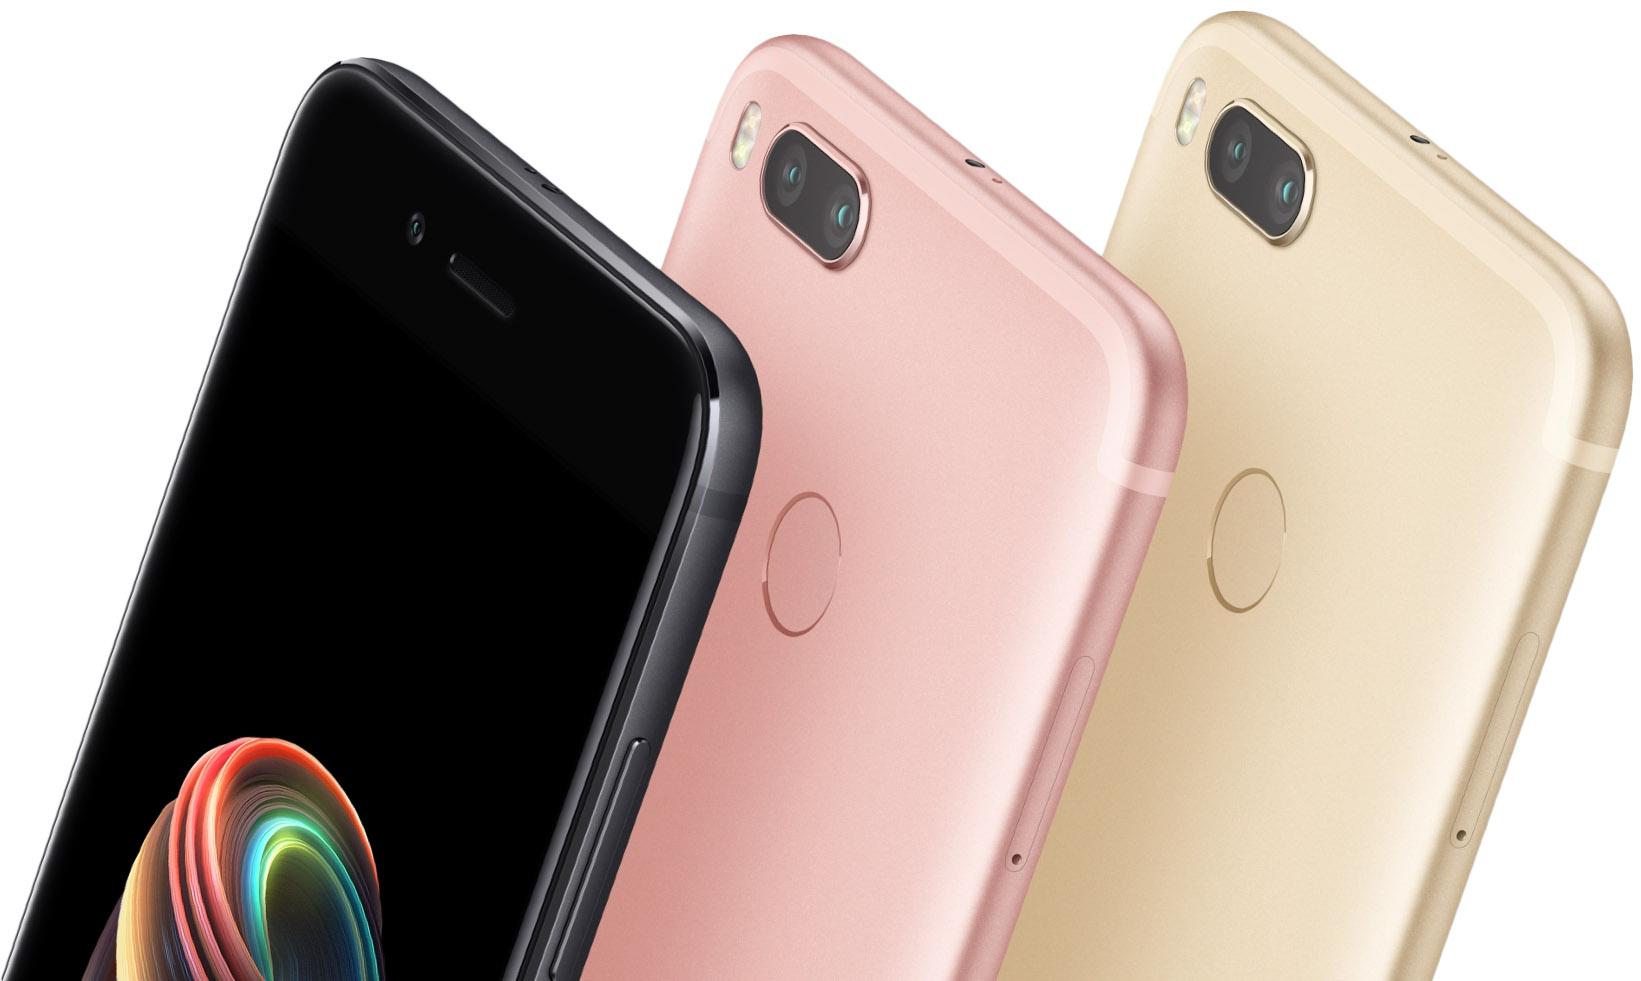 Xiaomi Mi A1 se slevou 19 dolarů u Geekbuying [sponzorovaný článek]